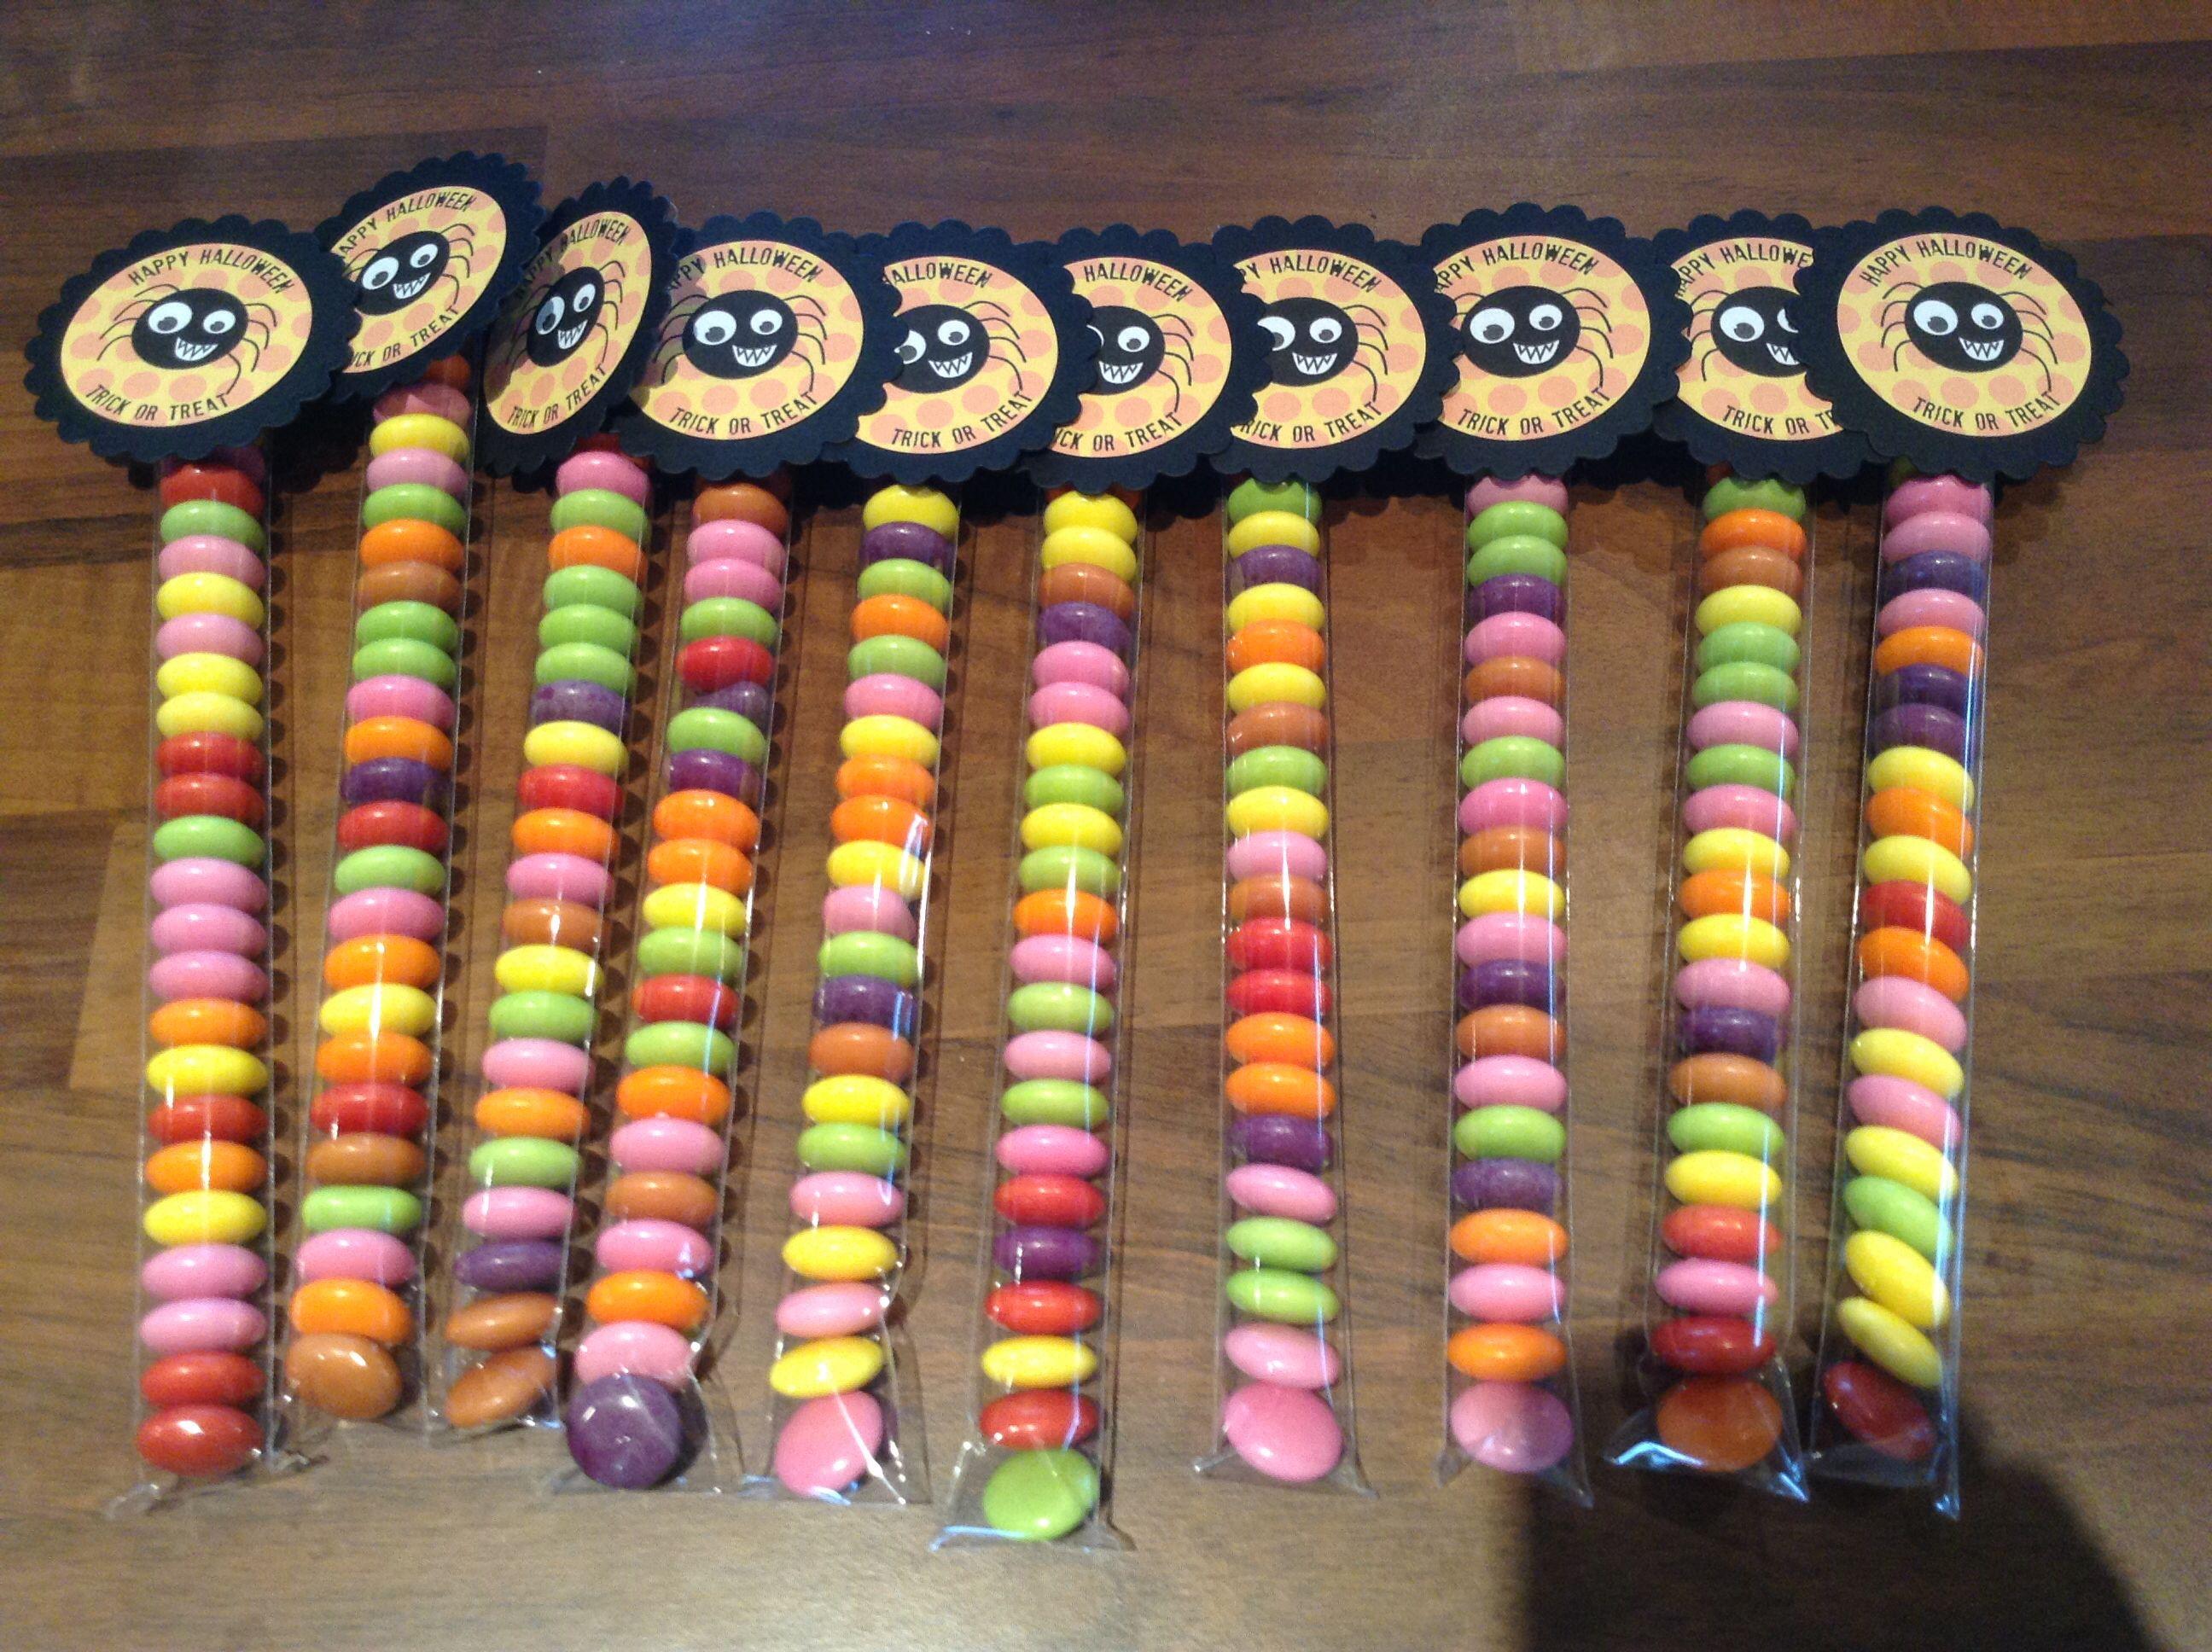 Halloween sweetie tubes filled with smarties